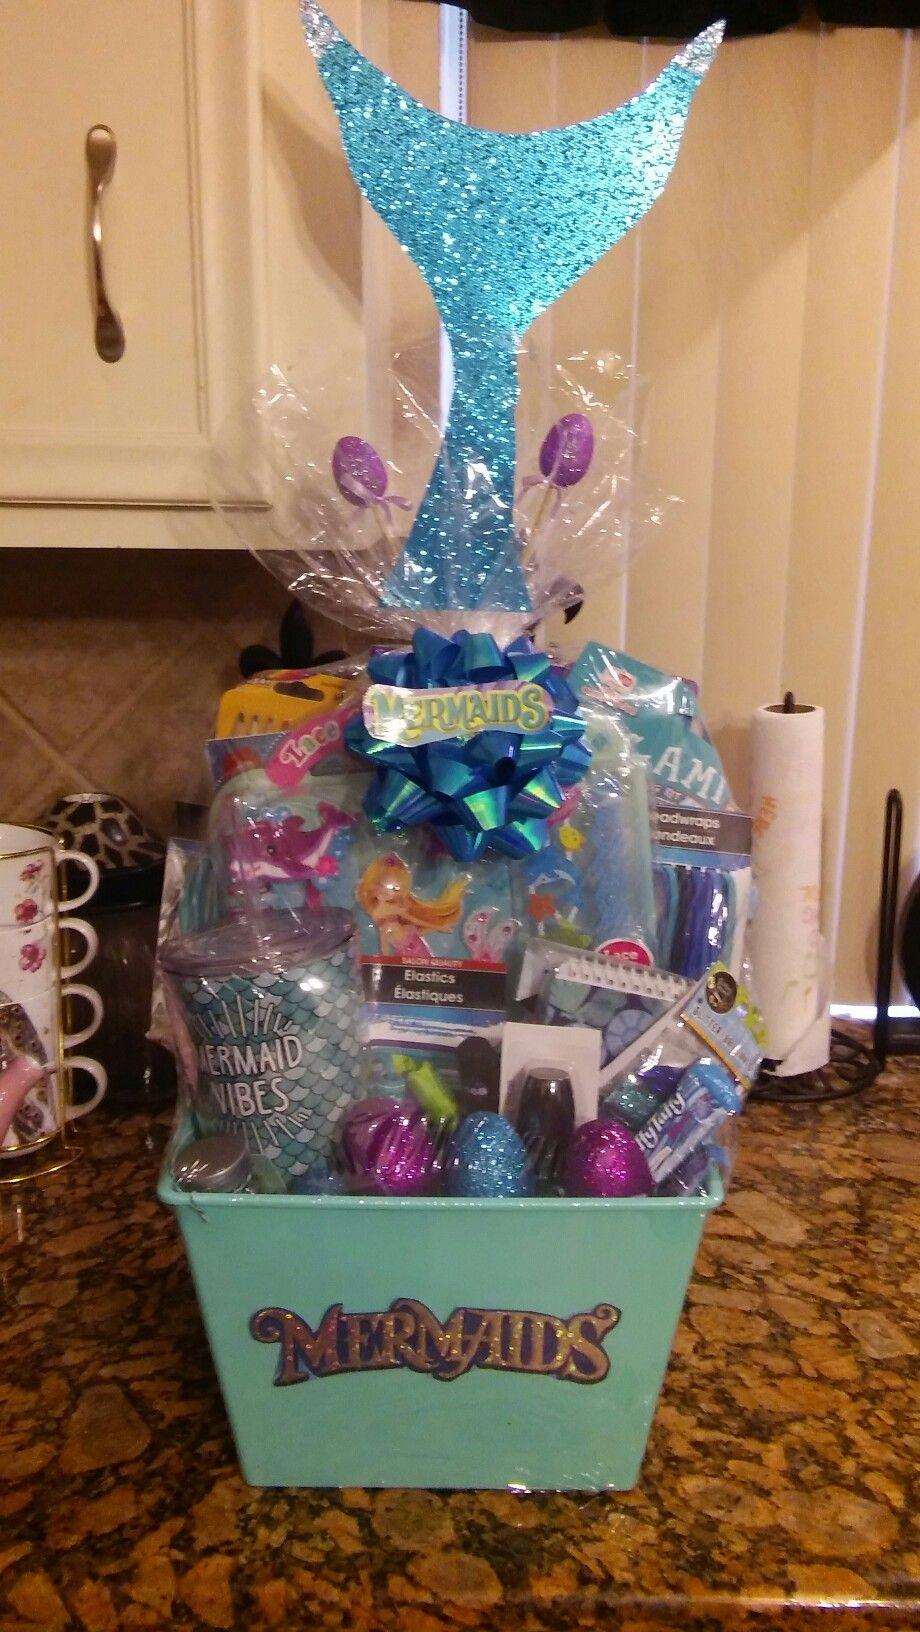 Mermaid easter basket gift baskets pinterest easter baskets mermaid easter basket negle Images